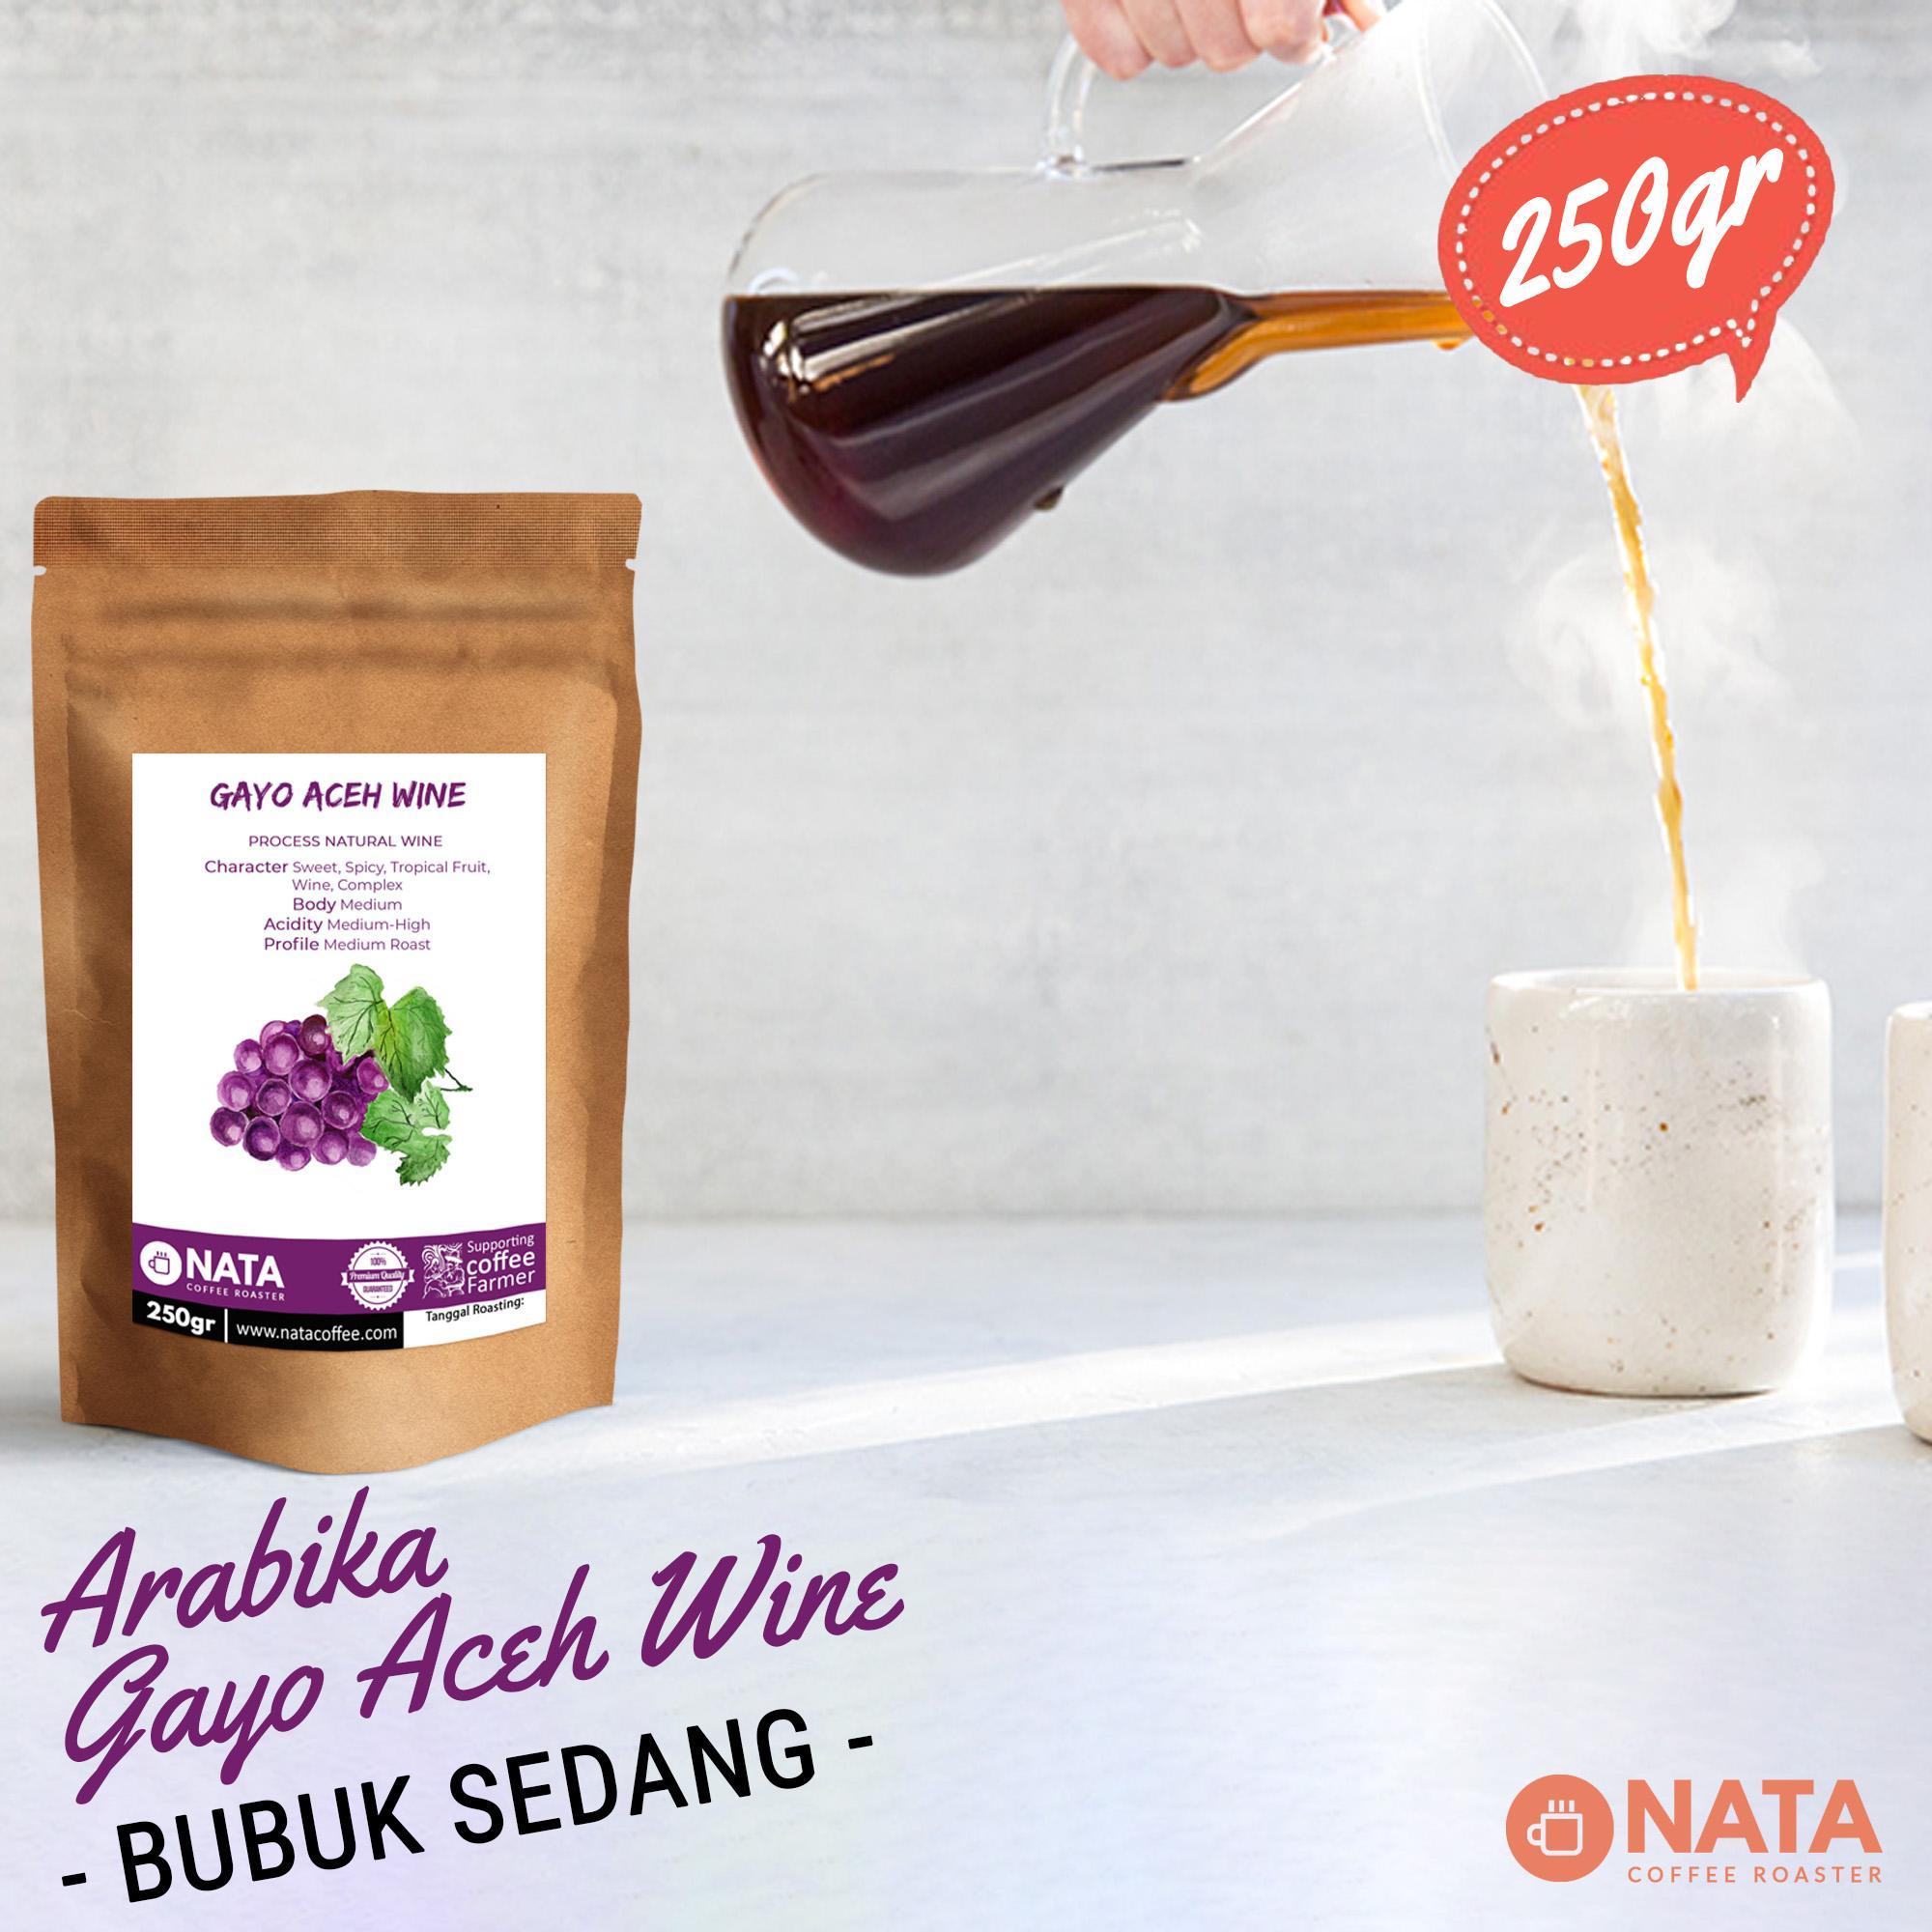 Nata Kopi Gayo Aceh Wine Arabika 250gr - BUBUK SEDANG